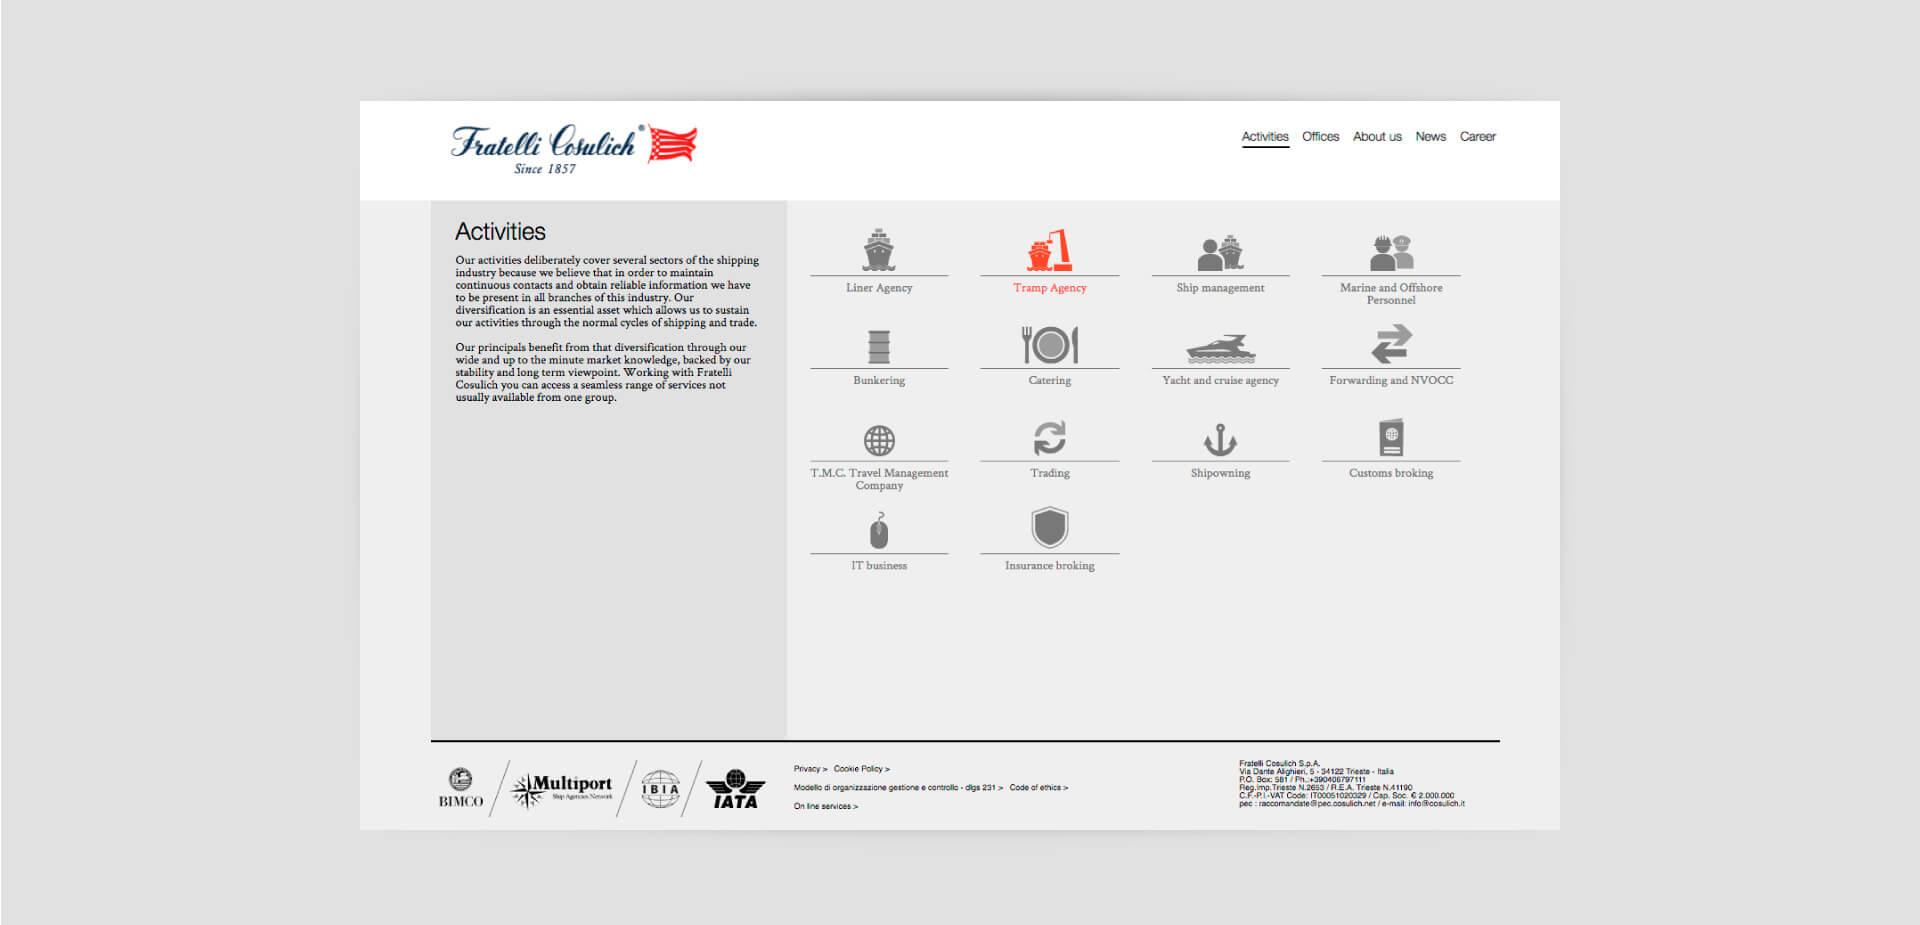 mintlab-webdesign-fratelli-cosulich-03